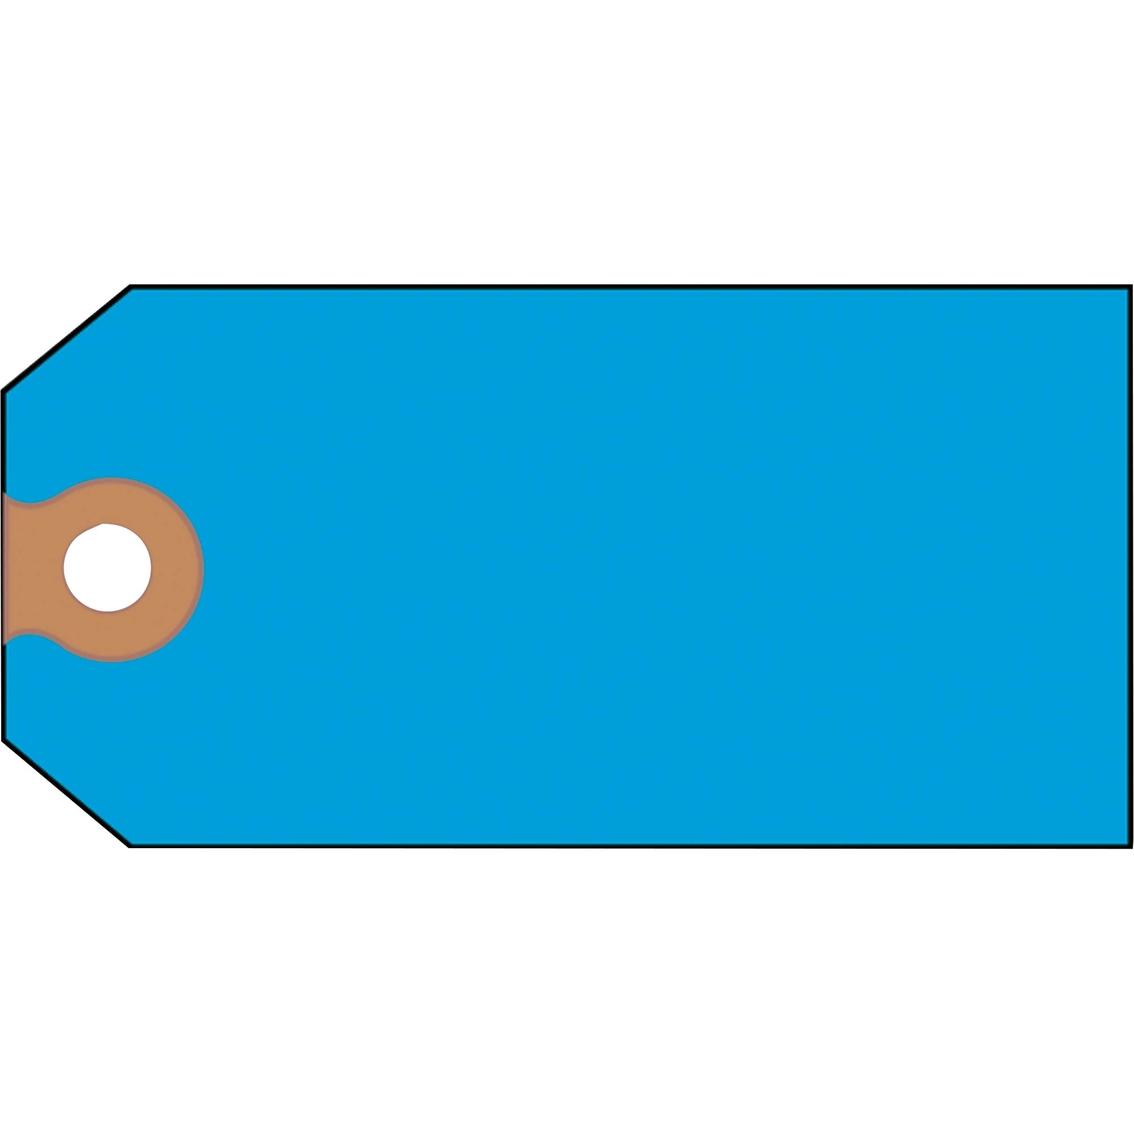 avery 4 3 4 x 2 3 8 shipping tags 1000 pk shipping shop the